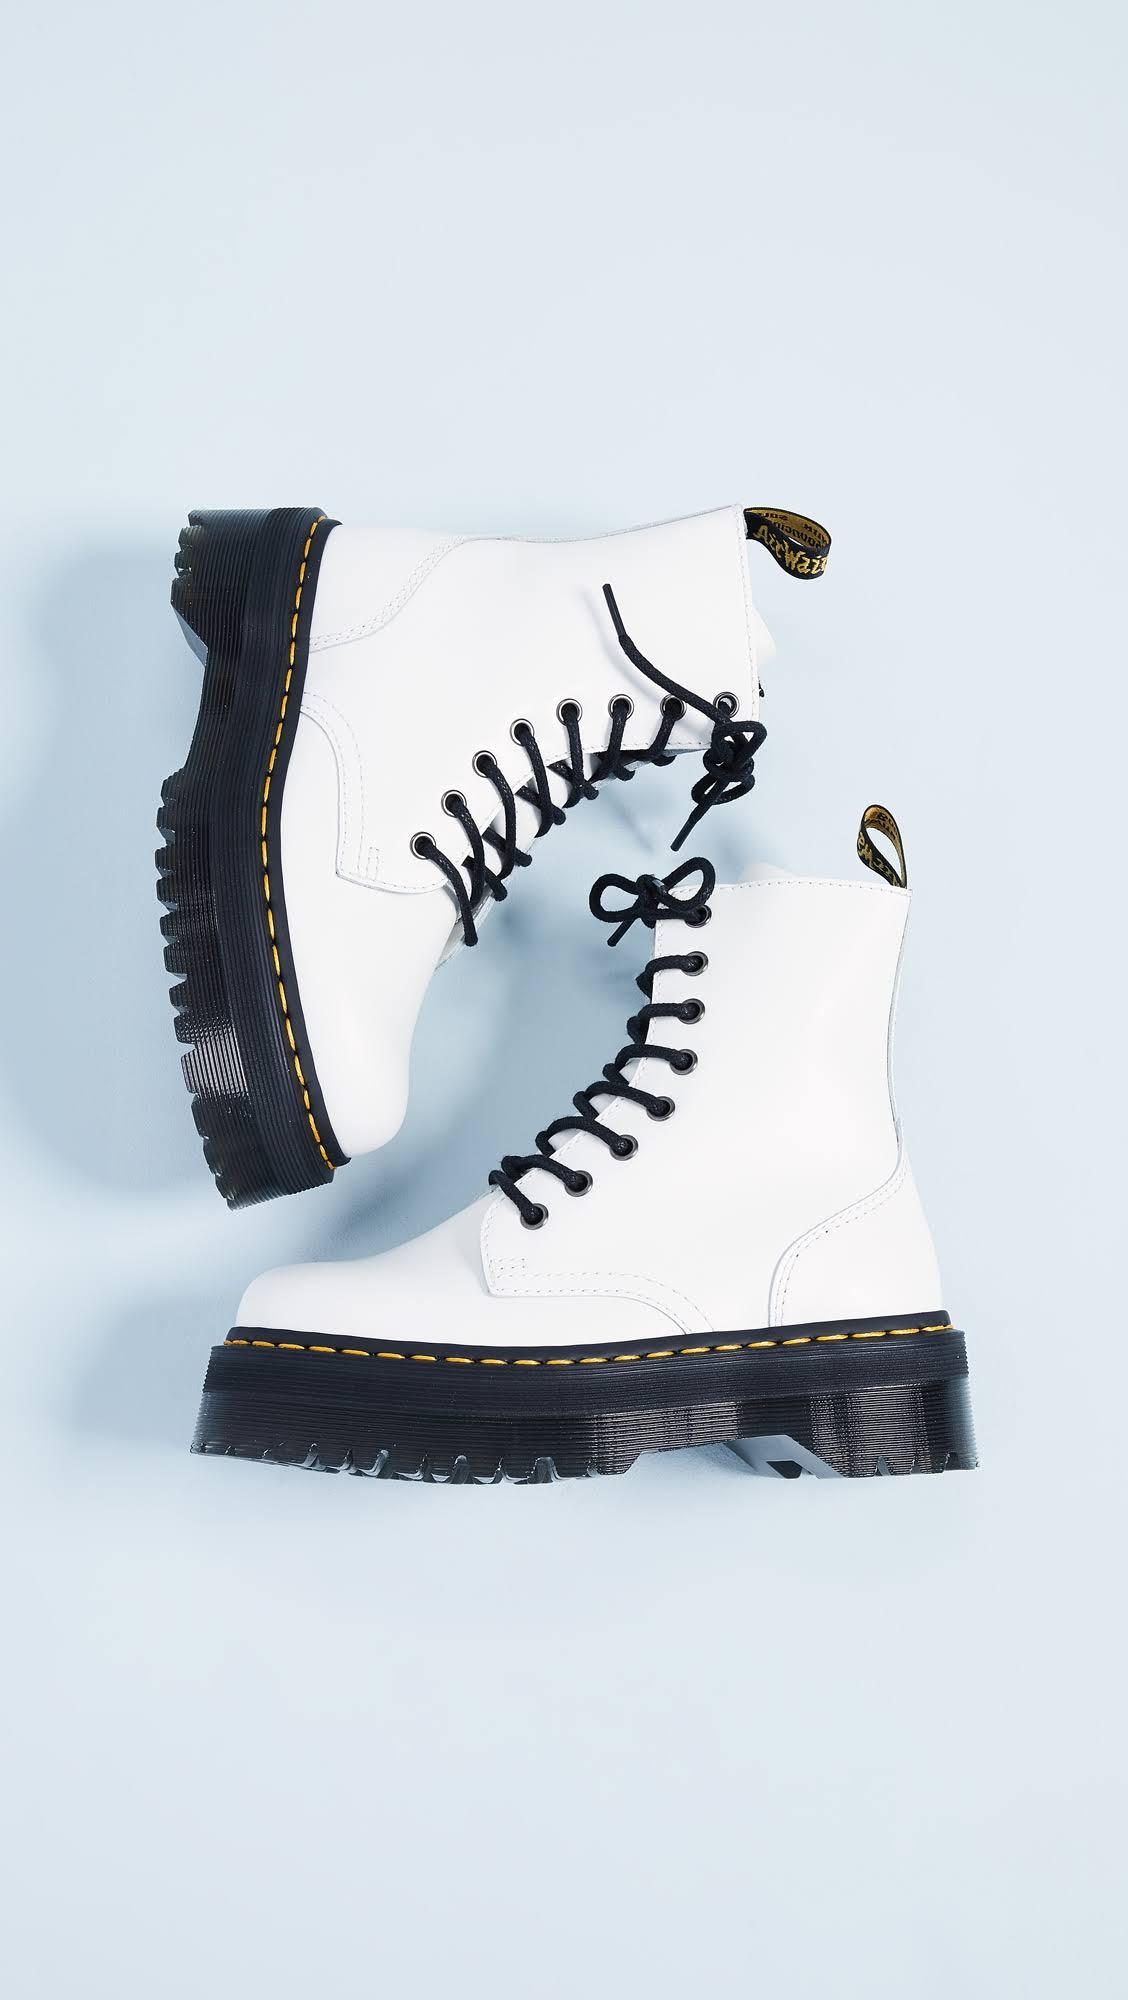 Liscio Martens Jadon Boots Dr White Lucidato N08nwm